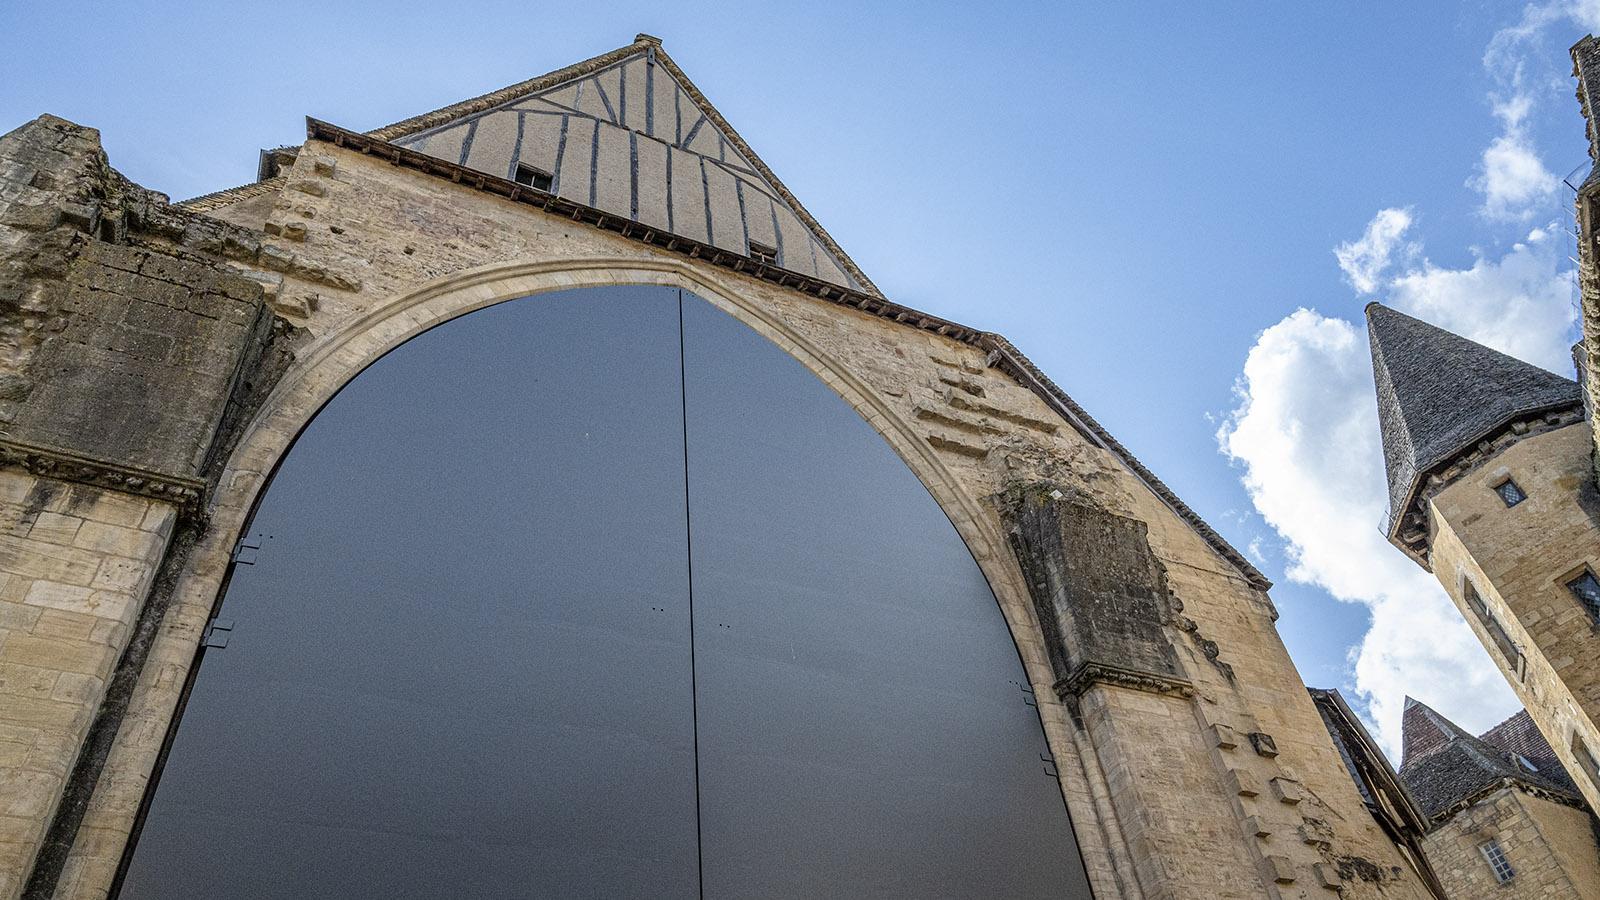 Sarlat, Kirchentor von Jean Nouvel. Foto: Hike Maunder